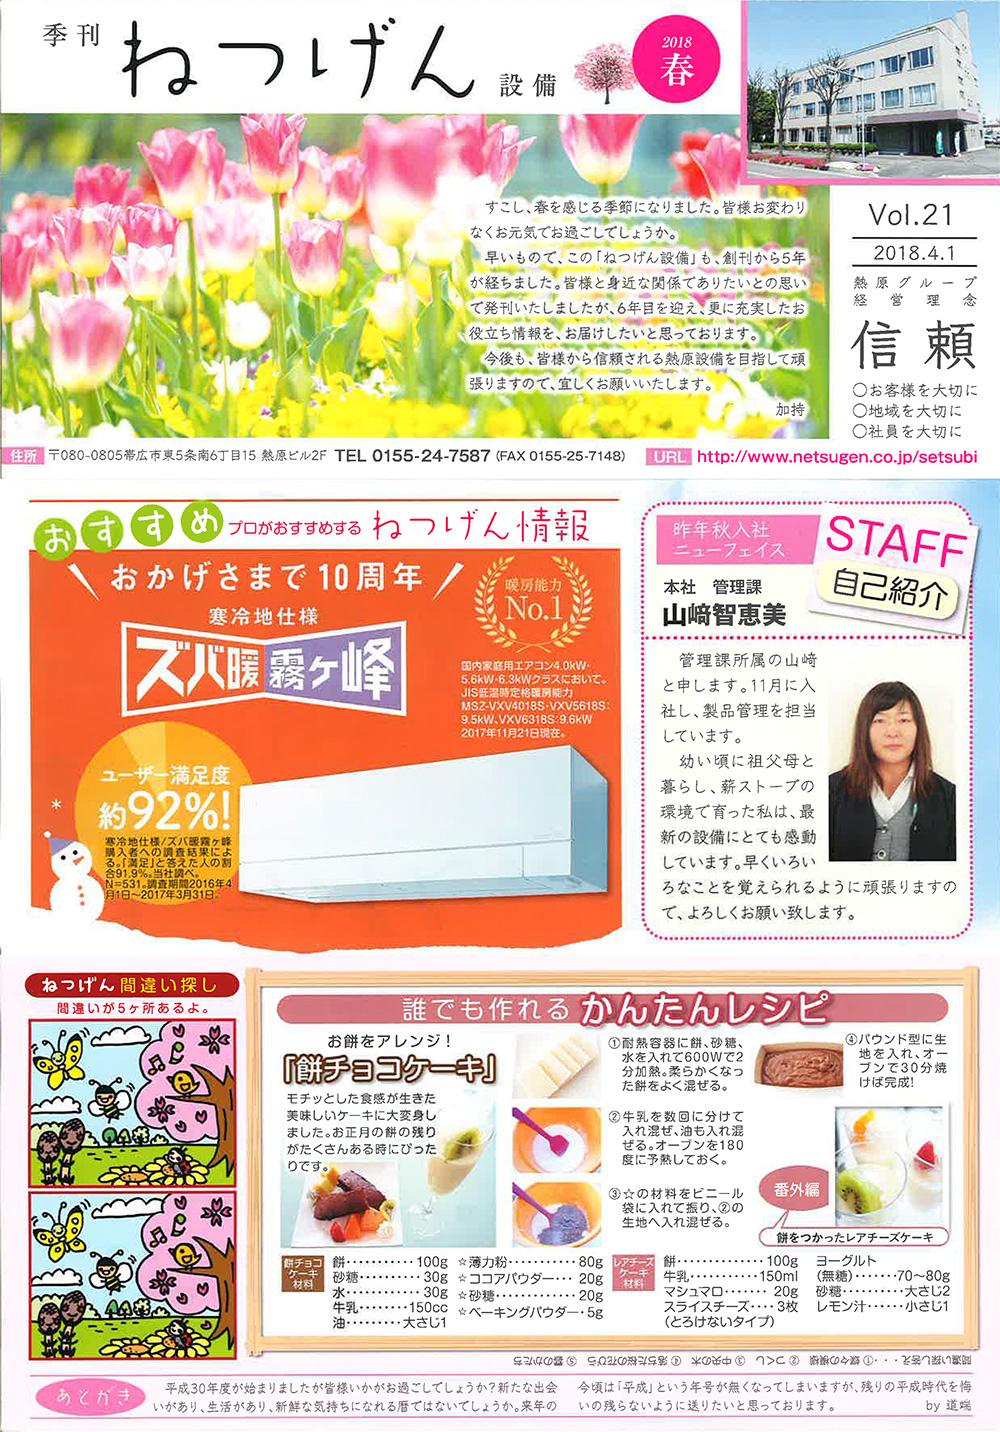 http://www.netsugen.co.jp/setsubi/information/images/180401kikan.jpg